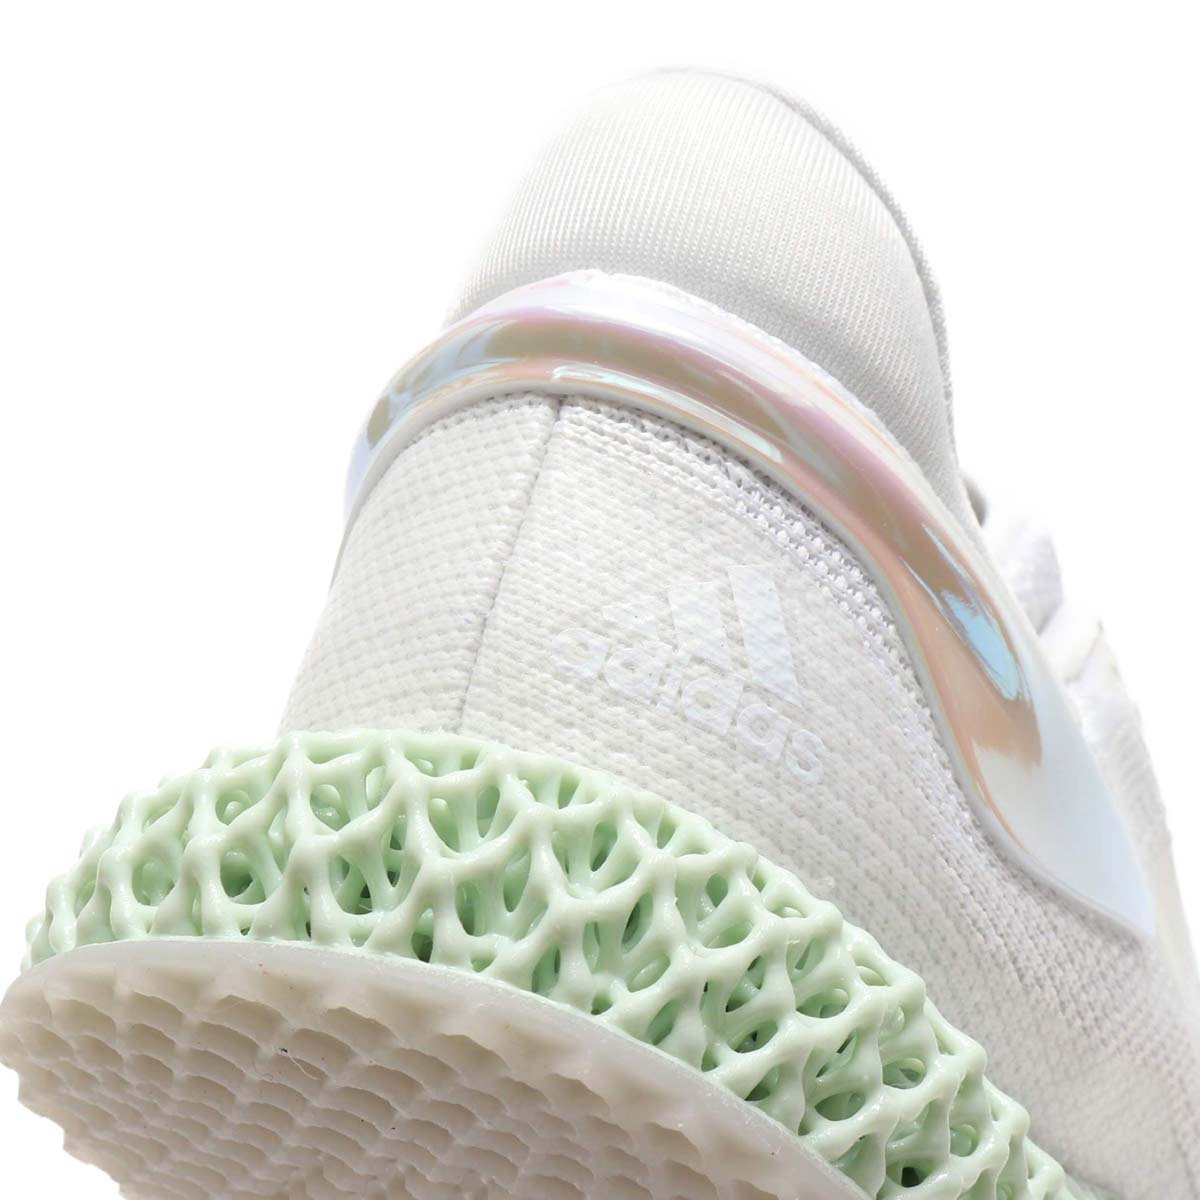 adidas 4D 1.0 FOOTWEAR WHITE / FOOTWEAR WHITE / FOOTWEAR WHITE FW1229 アディダス 4D 1.0 ホワイト